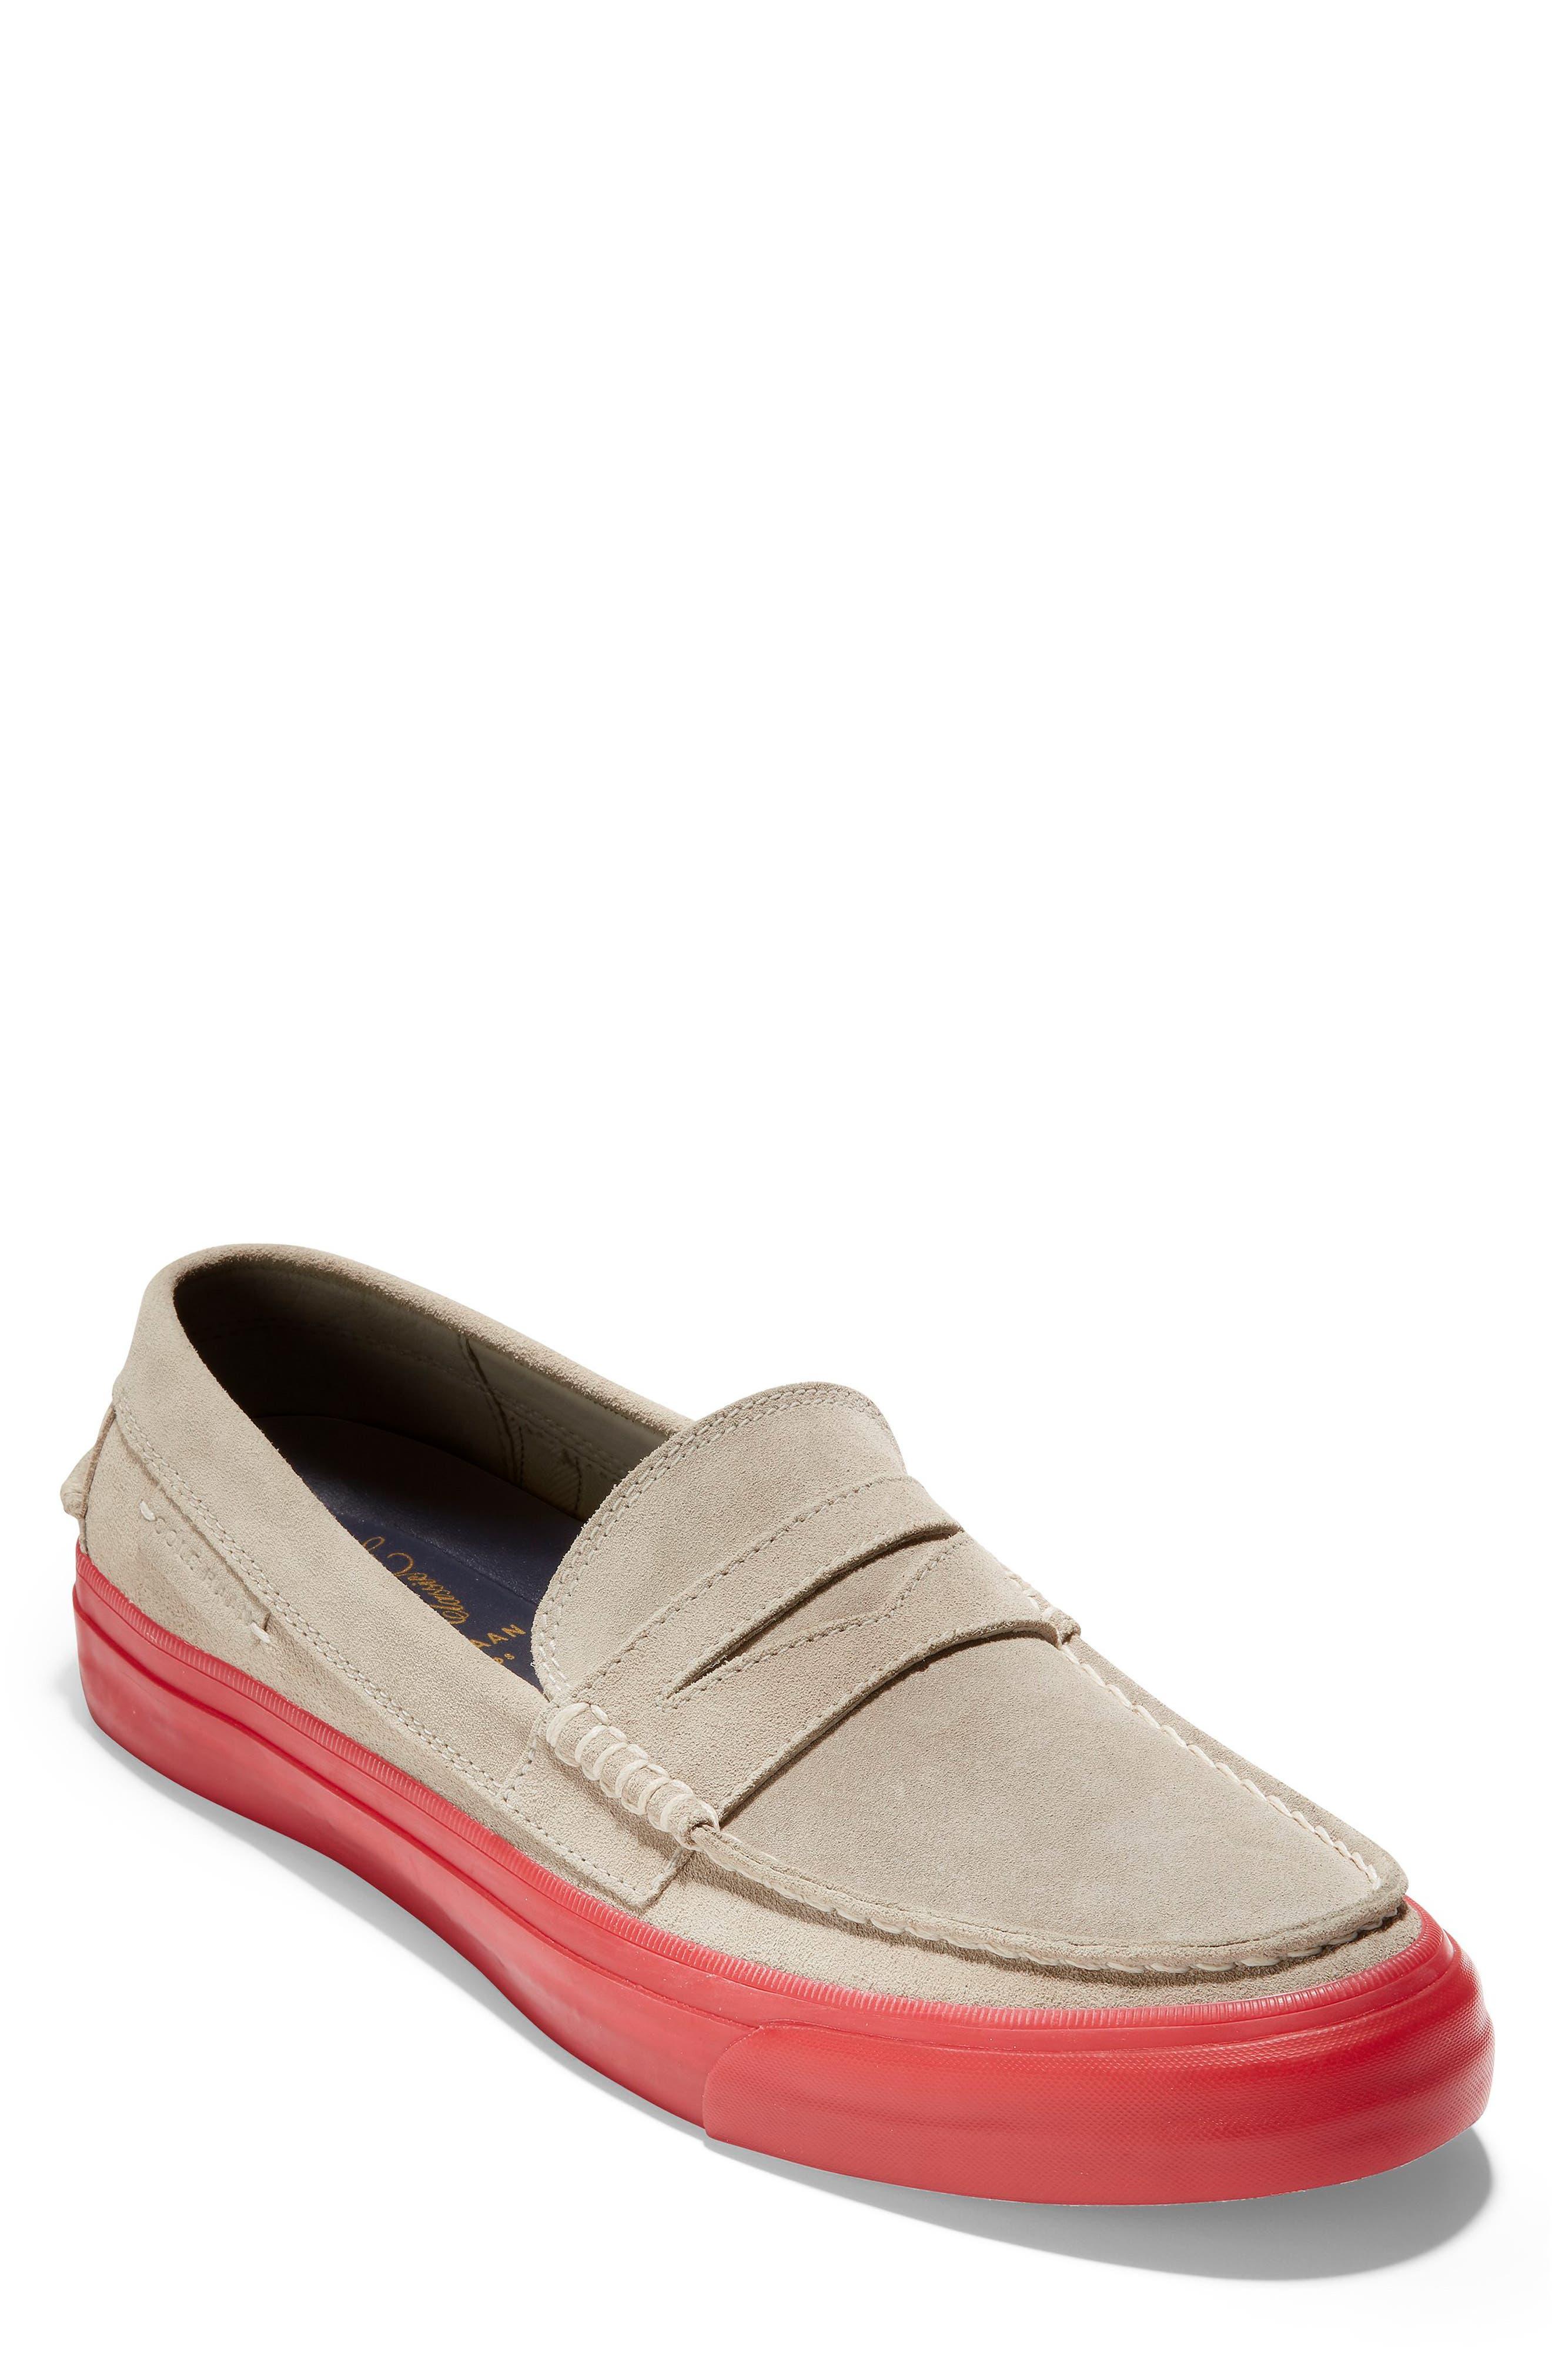 fad79e6130d Men's Cole Haan Loafers & Slip-Ons   Nordstrom